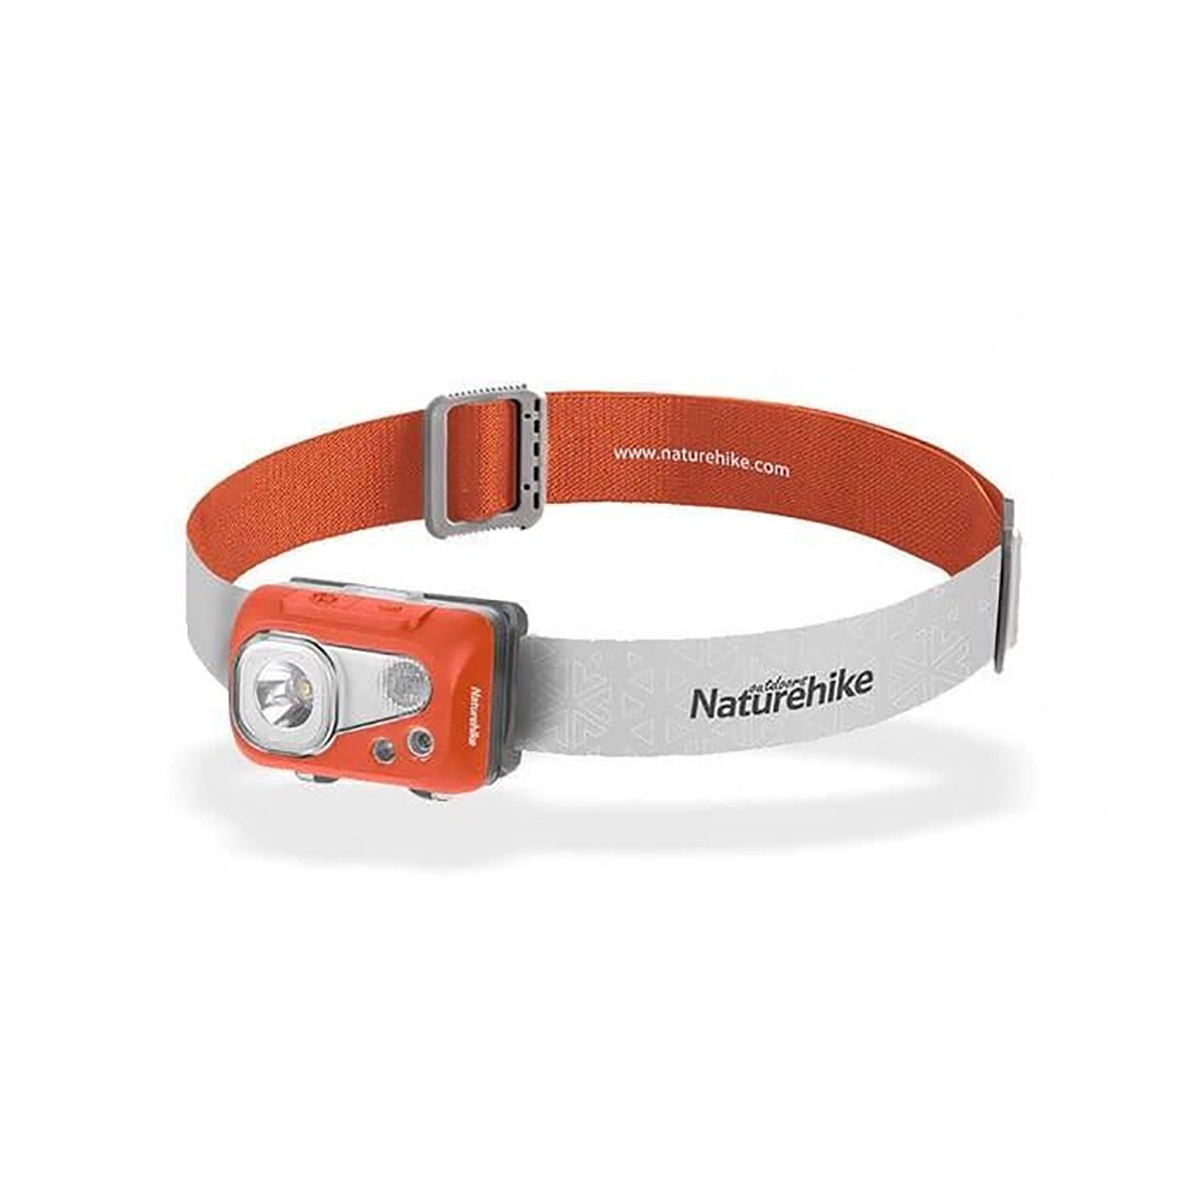 HEADLAMP NATUREHIKE LED CREE IPX7 280L